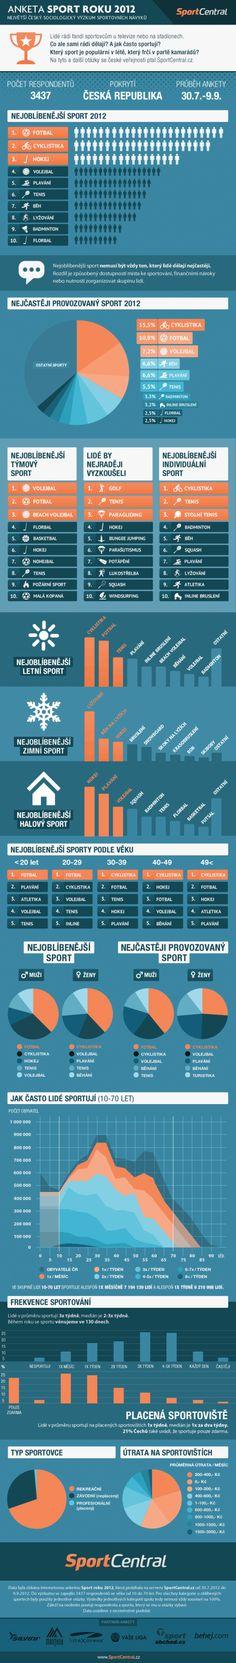 Anketa Sport roku 2012 (SPORT ROKU 2012 – INFOGRAFIKA)